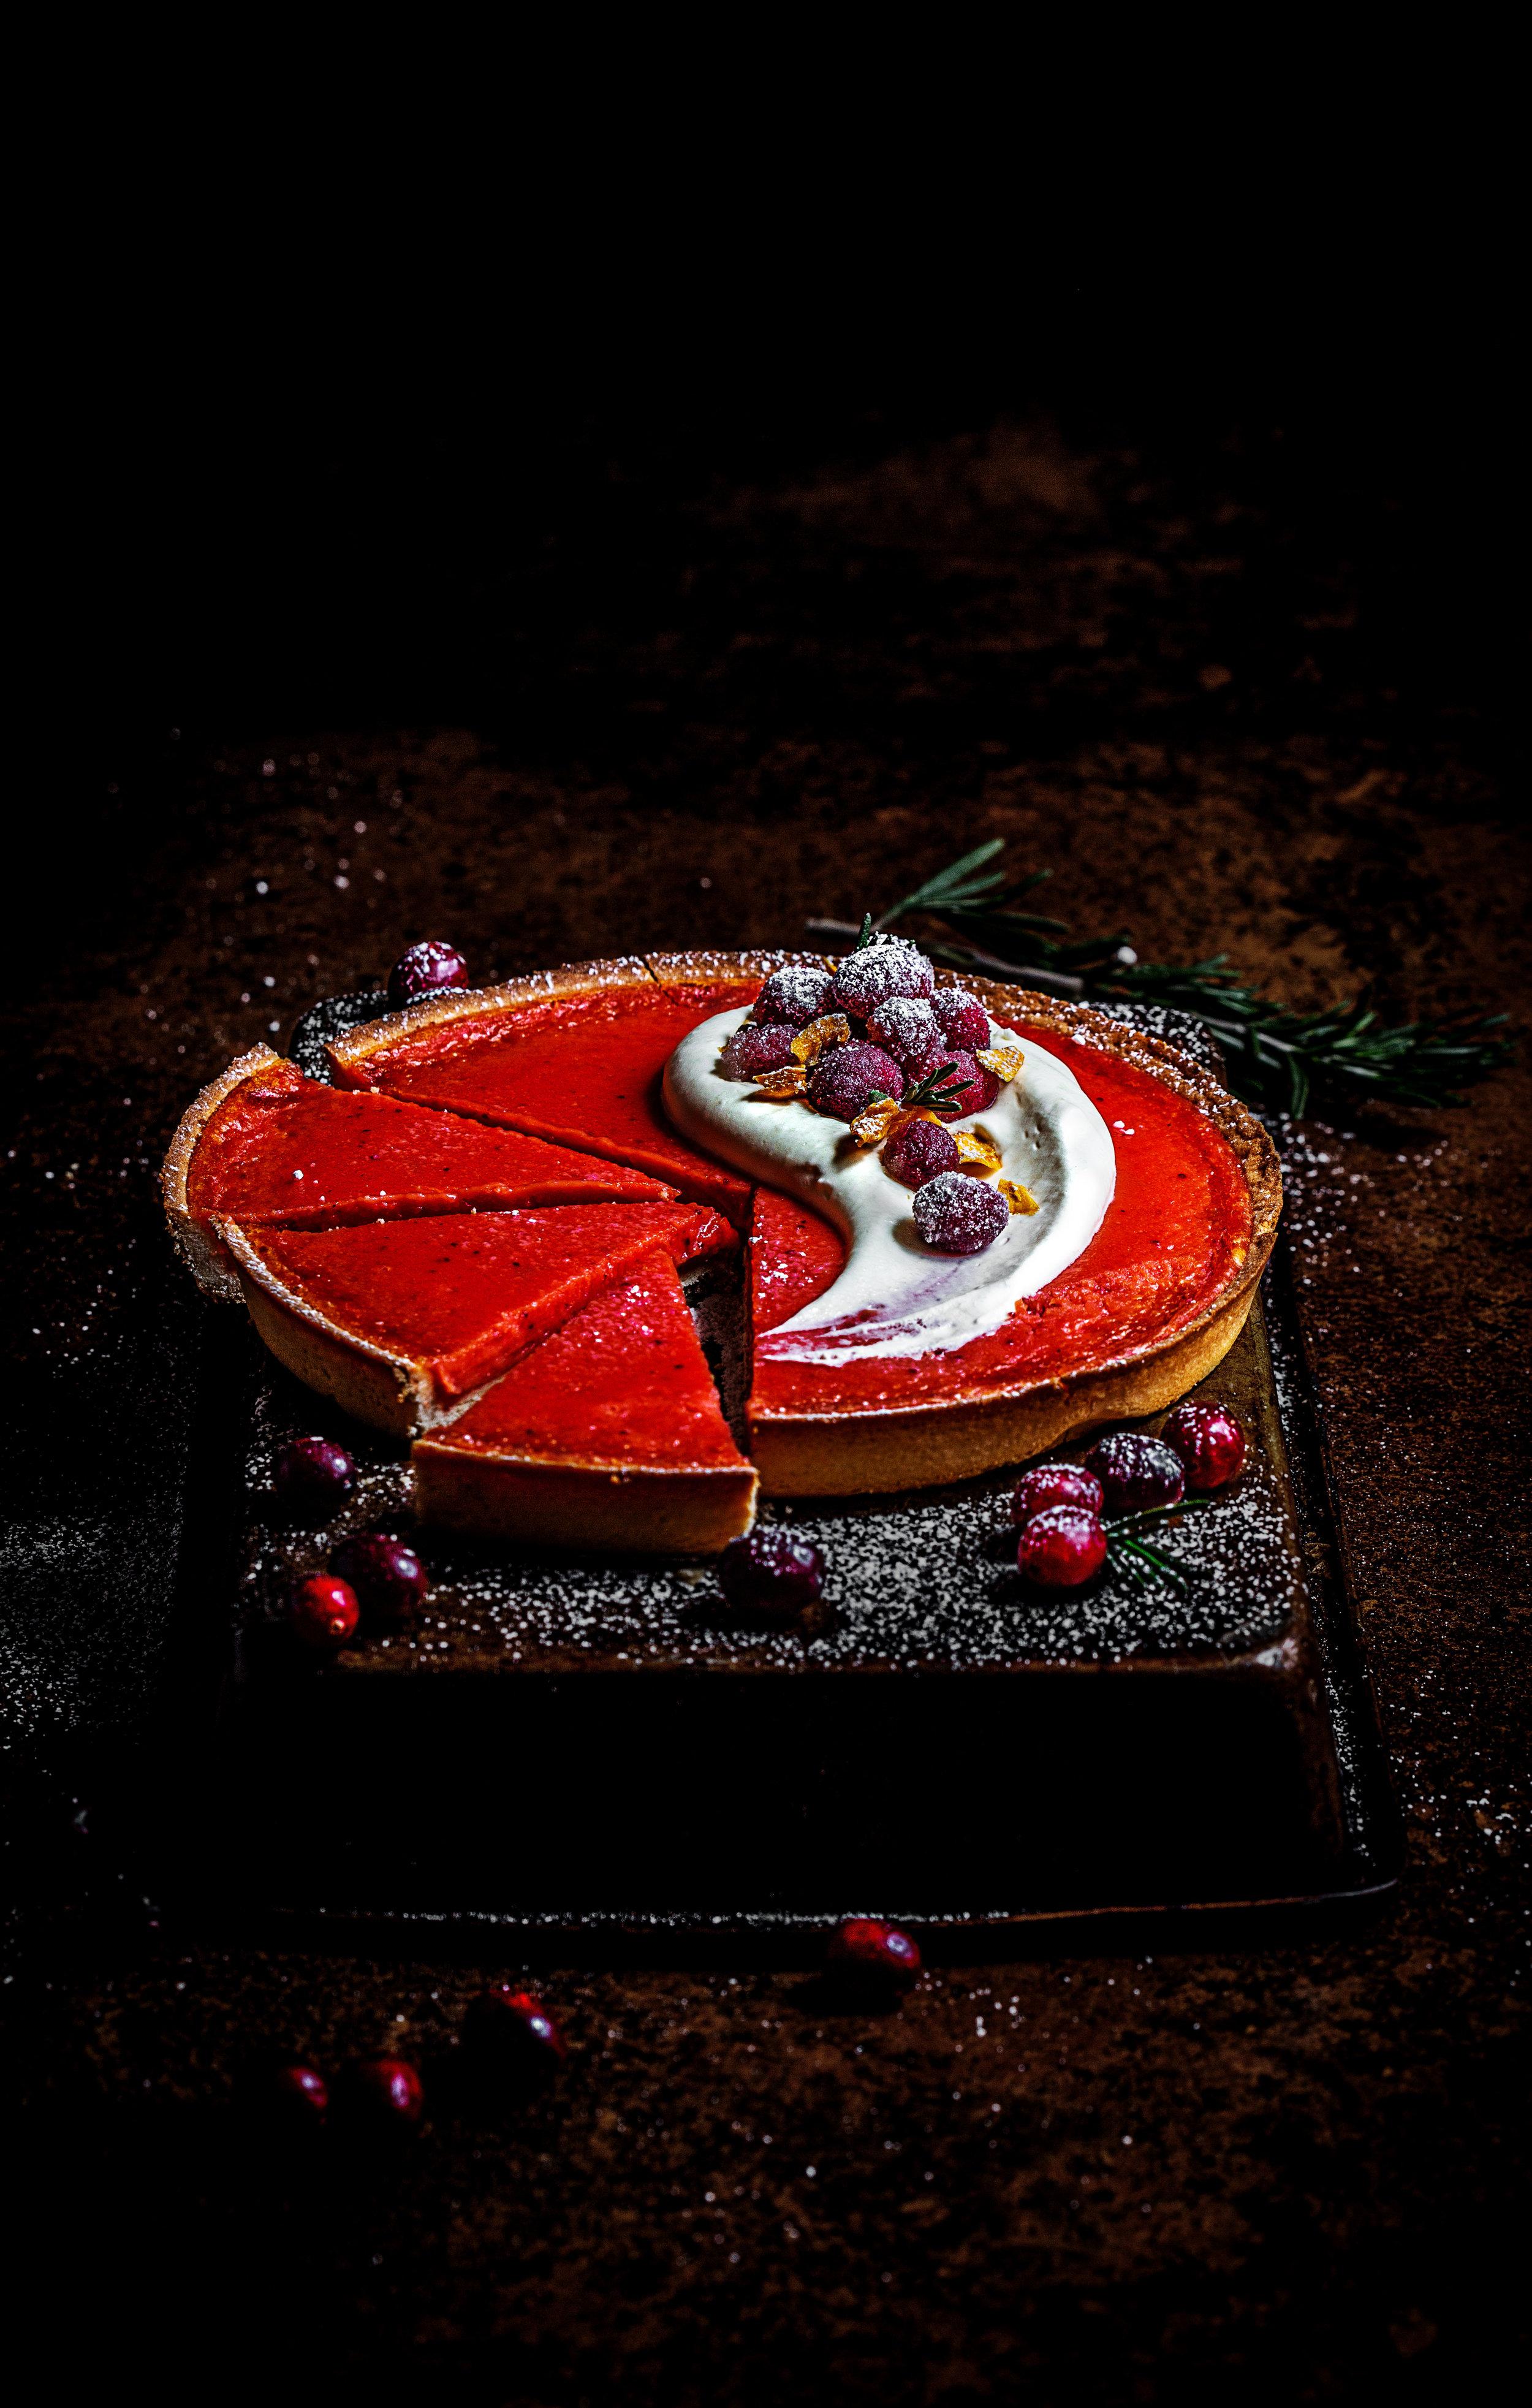 Cranberry-curd-tart-075.jpg